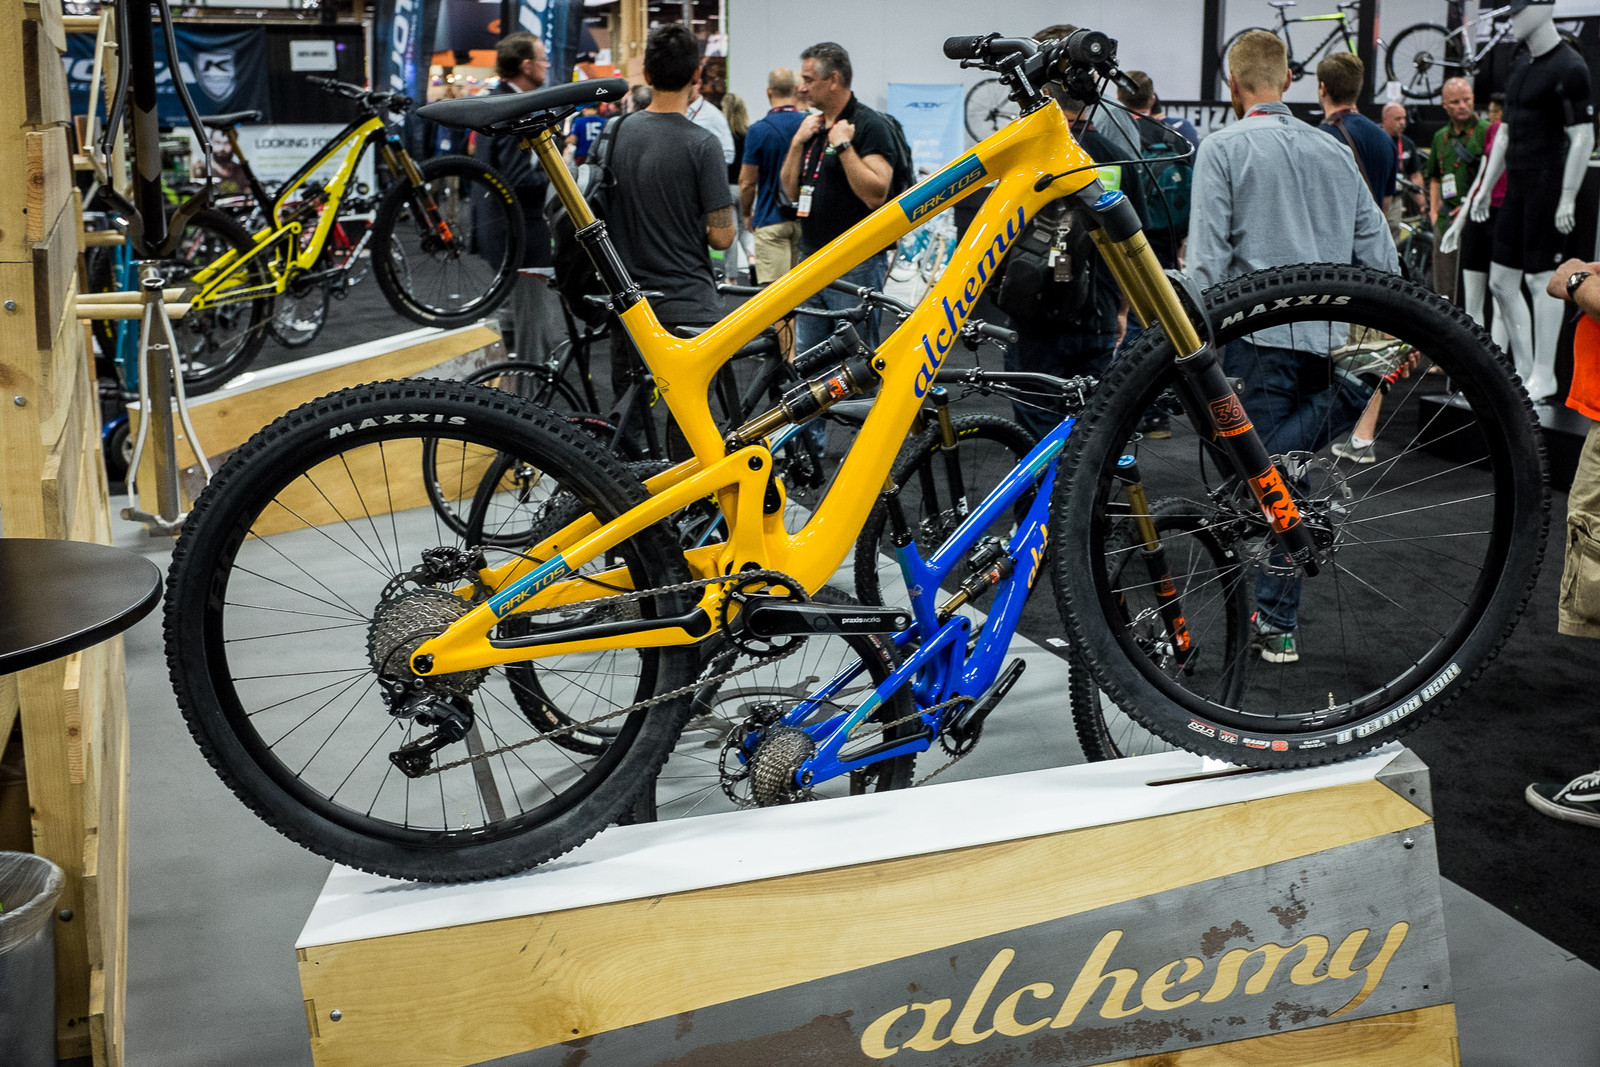 Alchemy Arktos - INTERBIKE - 2017 Enduro and Trail Bikes - Mountain Biking Pictures - Vital MTB